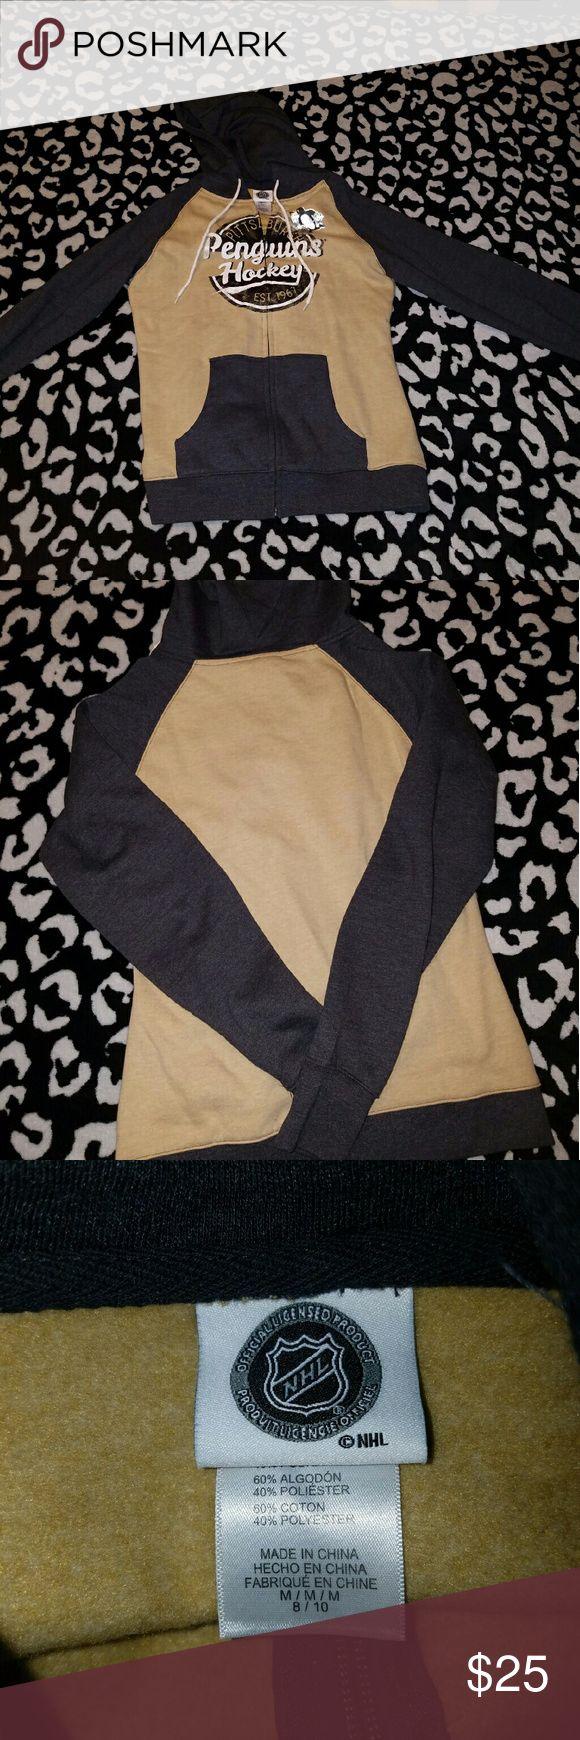 Never worn! Pittsburgh Penguins zip up hoodie! NWOT NHL licensed brand women's Pittsburgh Penguins full zip hoodie. Good quality, thick. Tan/gold and gray. NHL Tops Sweatshirts & Hoodies